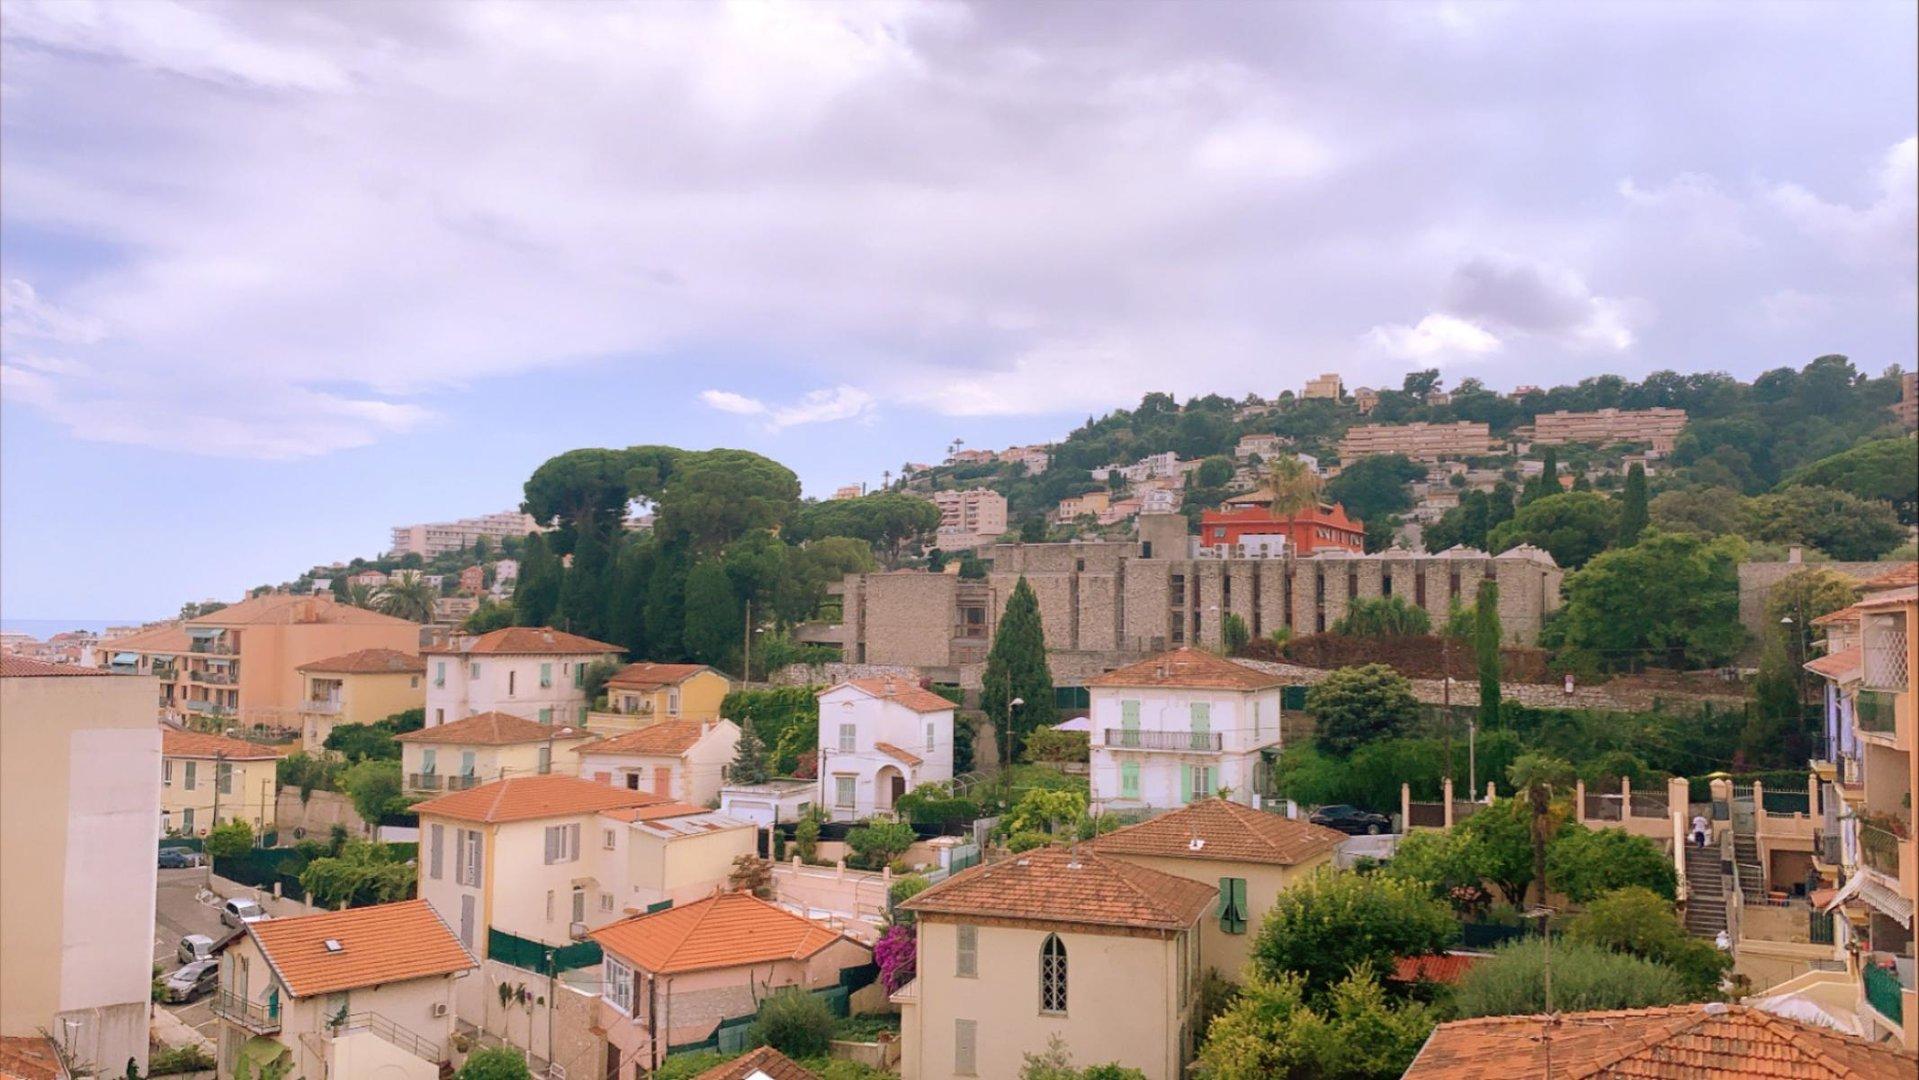 A Vendre, 4 Pièces Nice, Villa Arson